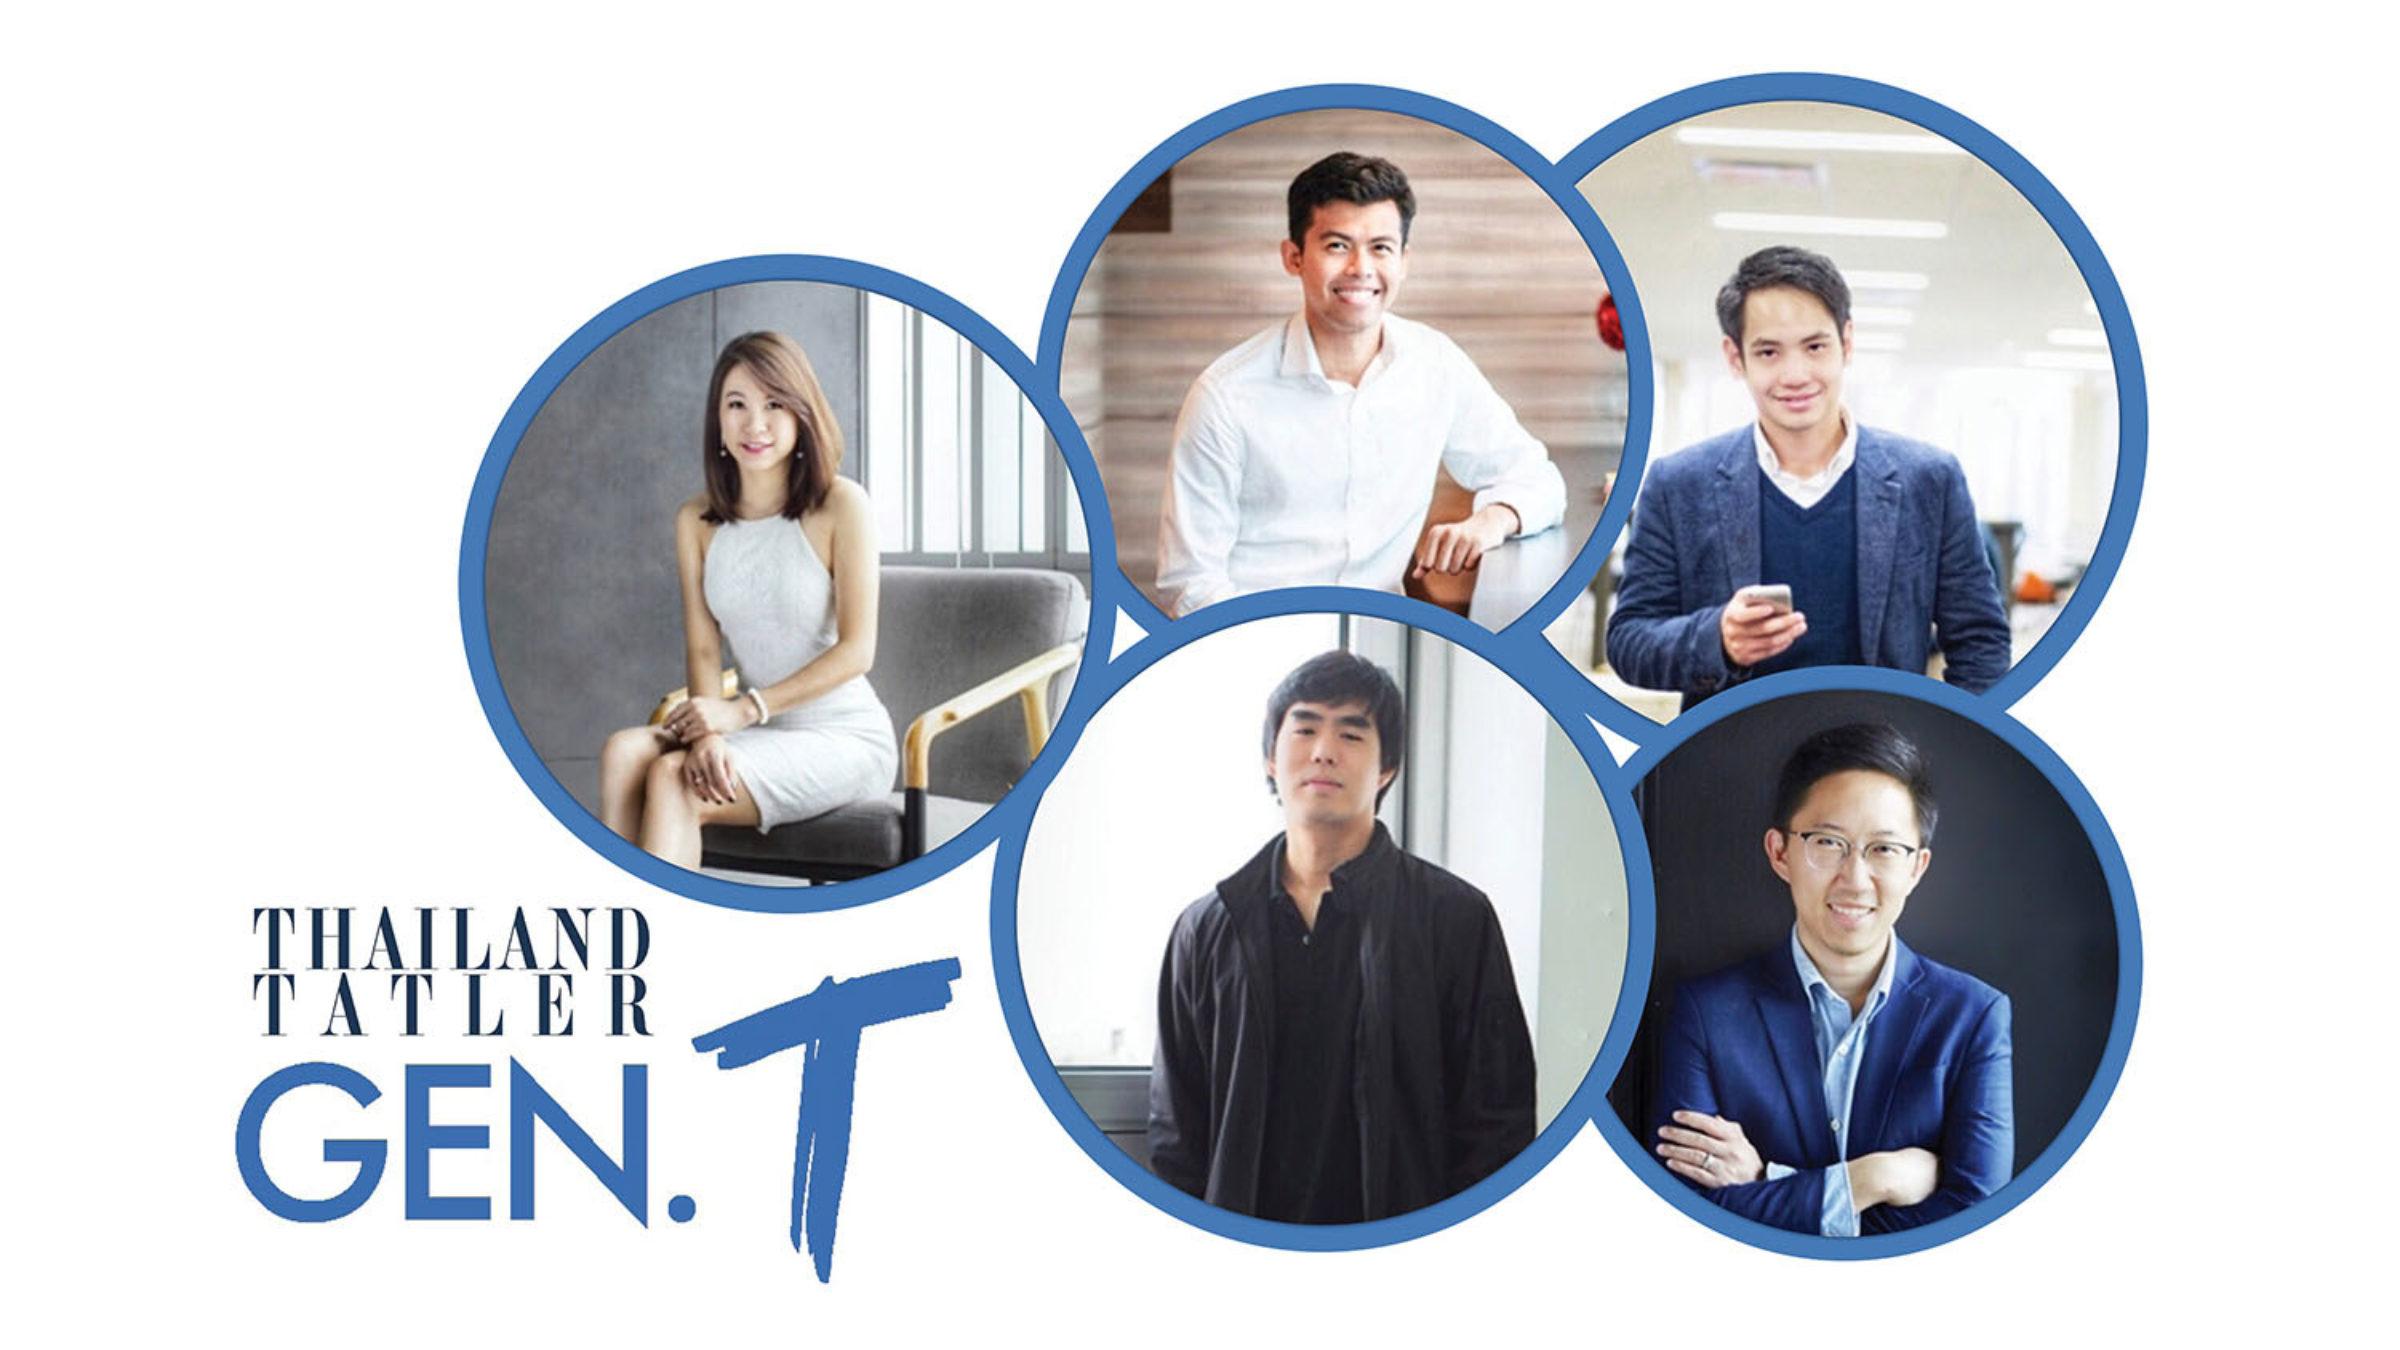 Alumni Five on Thailand Tatler's Generation T List 2018